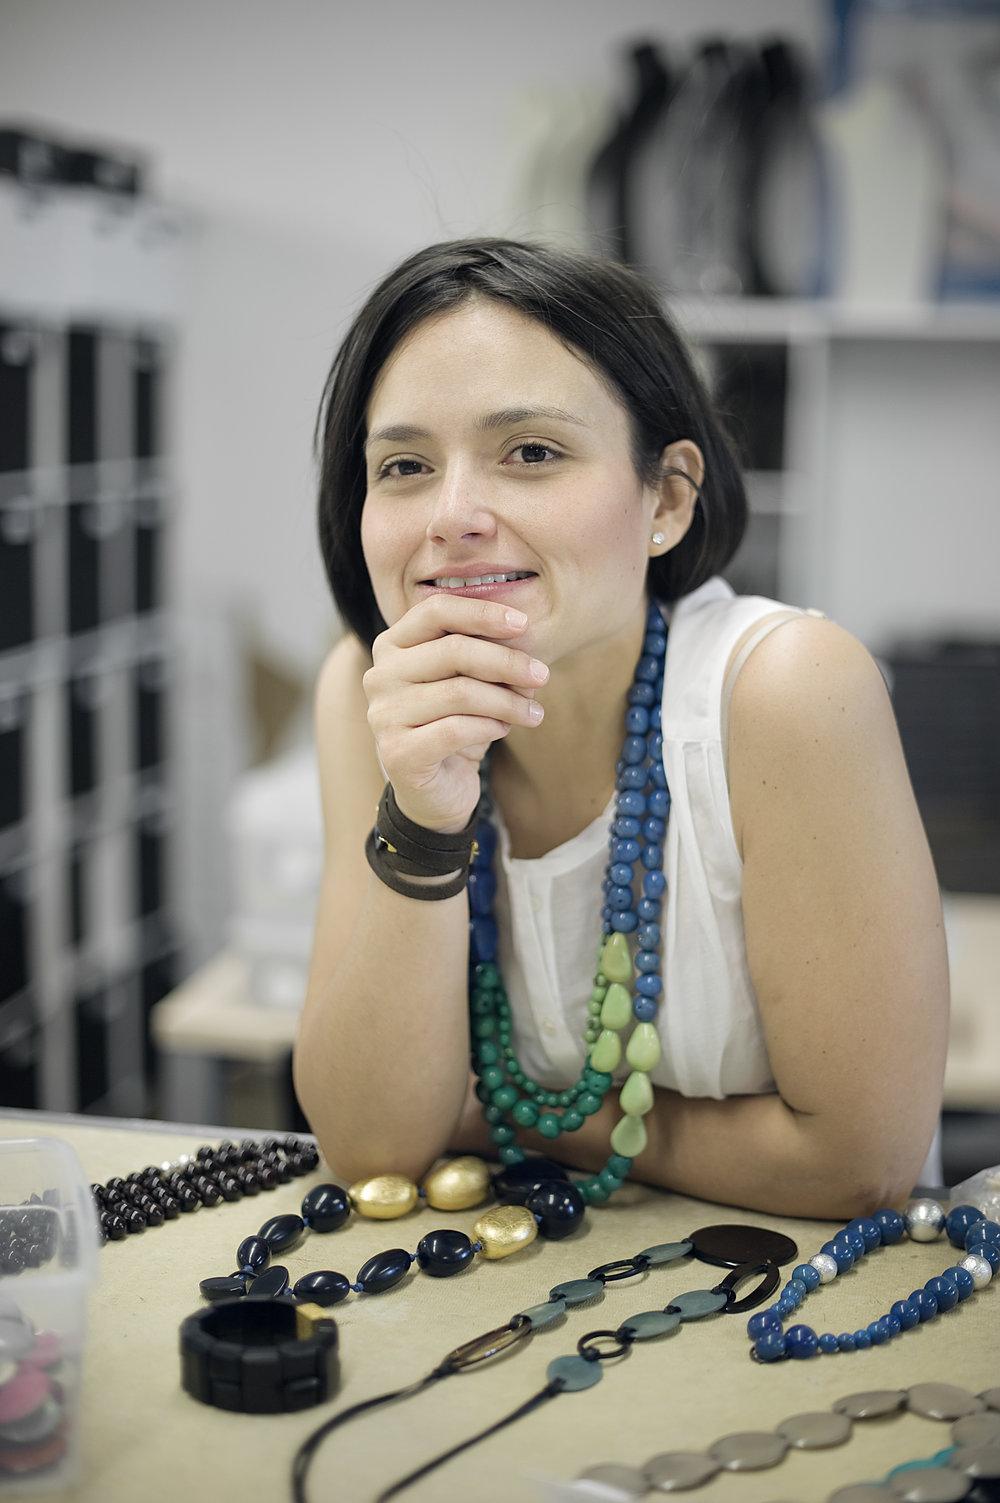 Paola Delgado of Mujus